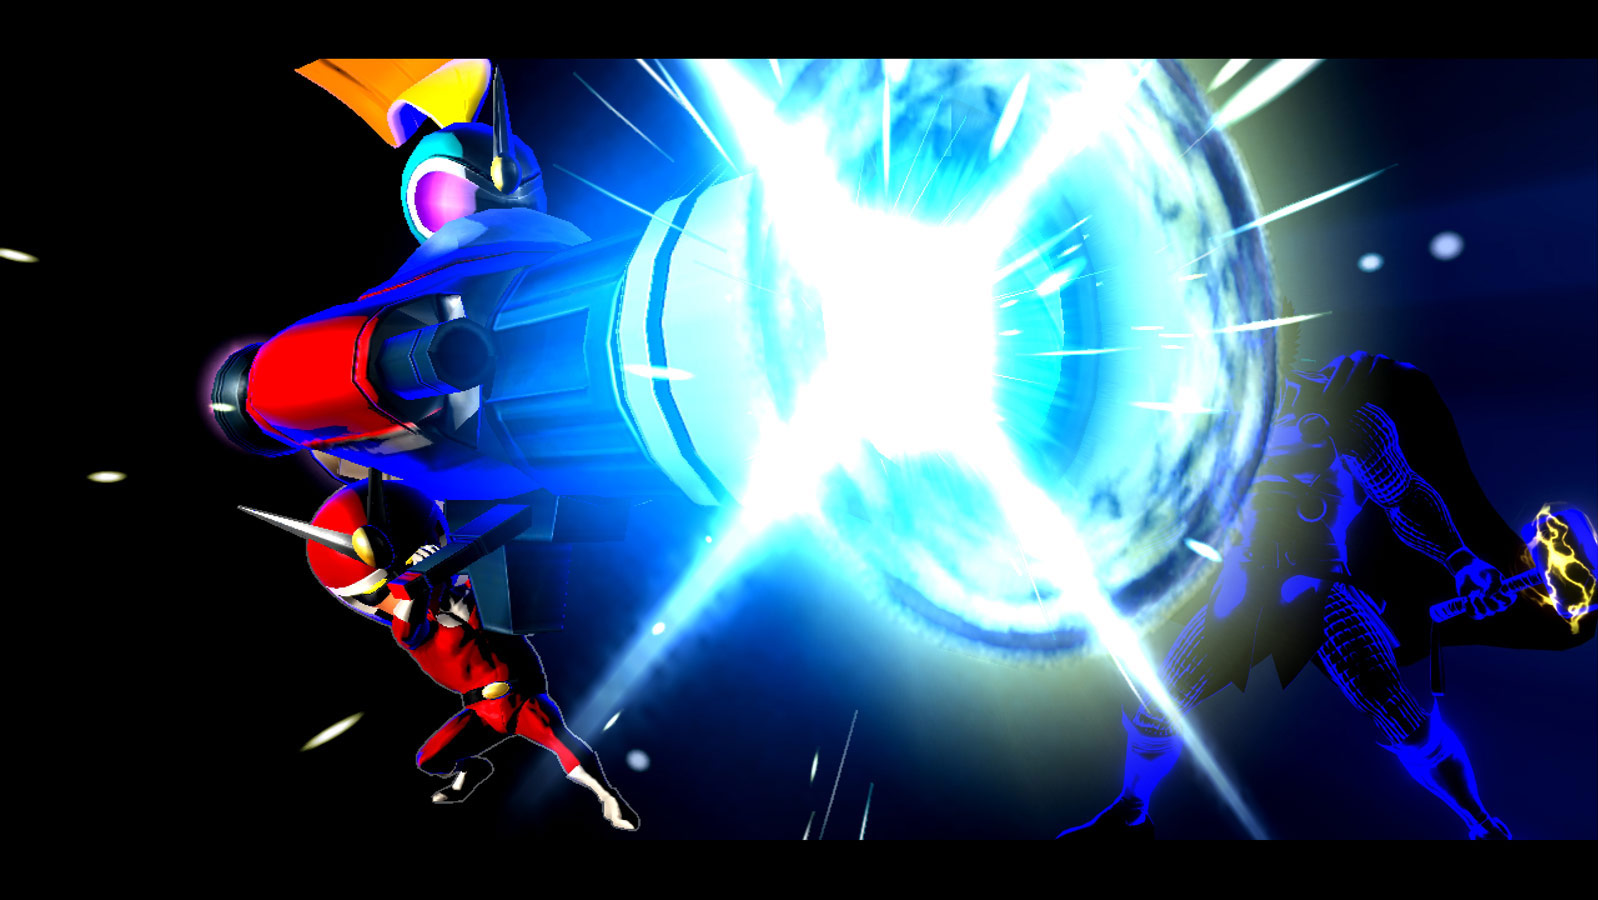 Marvel vs. Capcom 3 screen shot Aug. 18 image #13